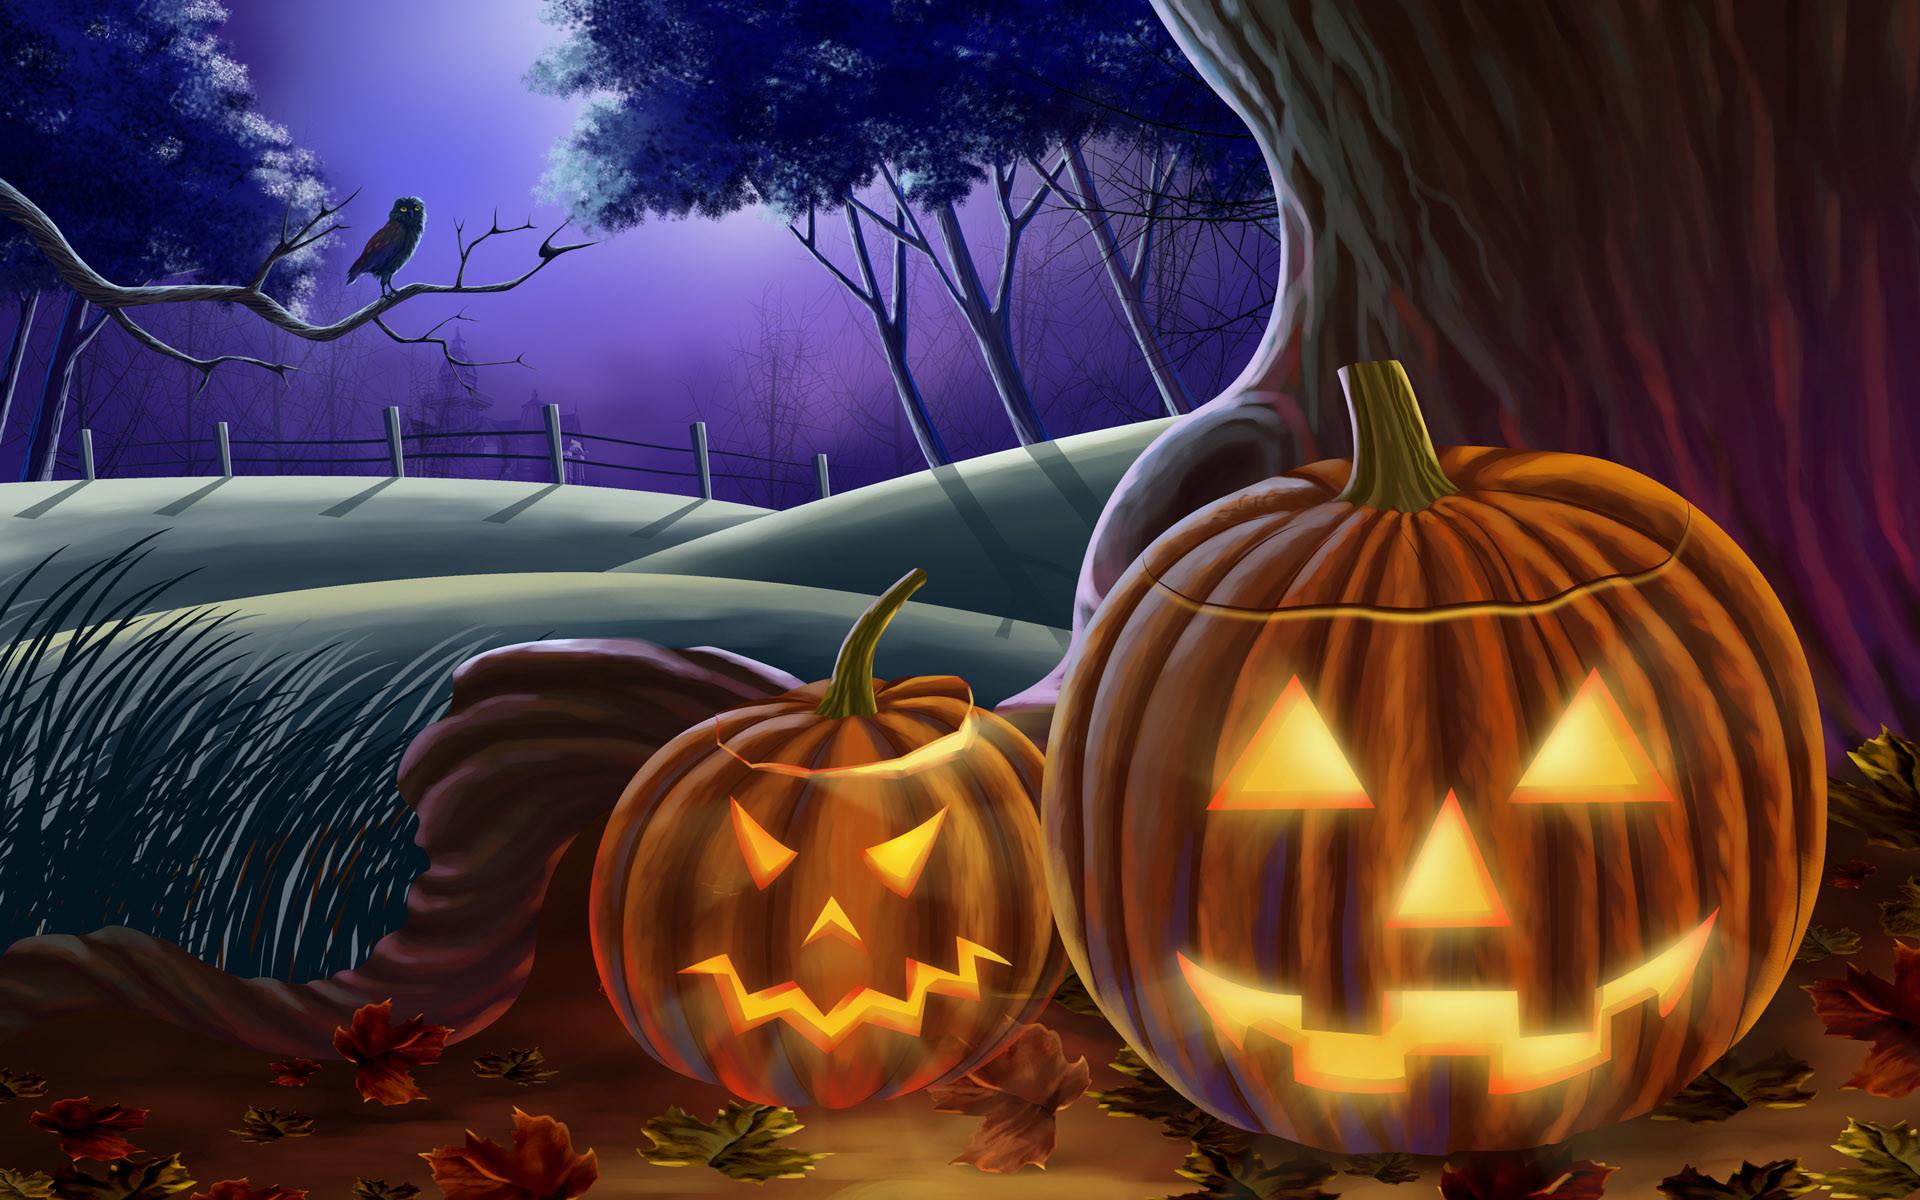 … Animated Halloween Backgrounds For Desktop (16) …